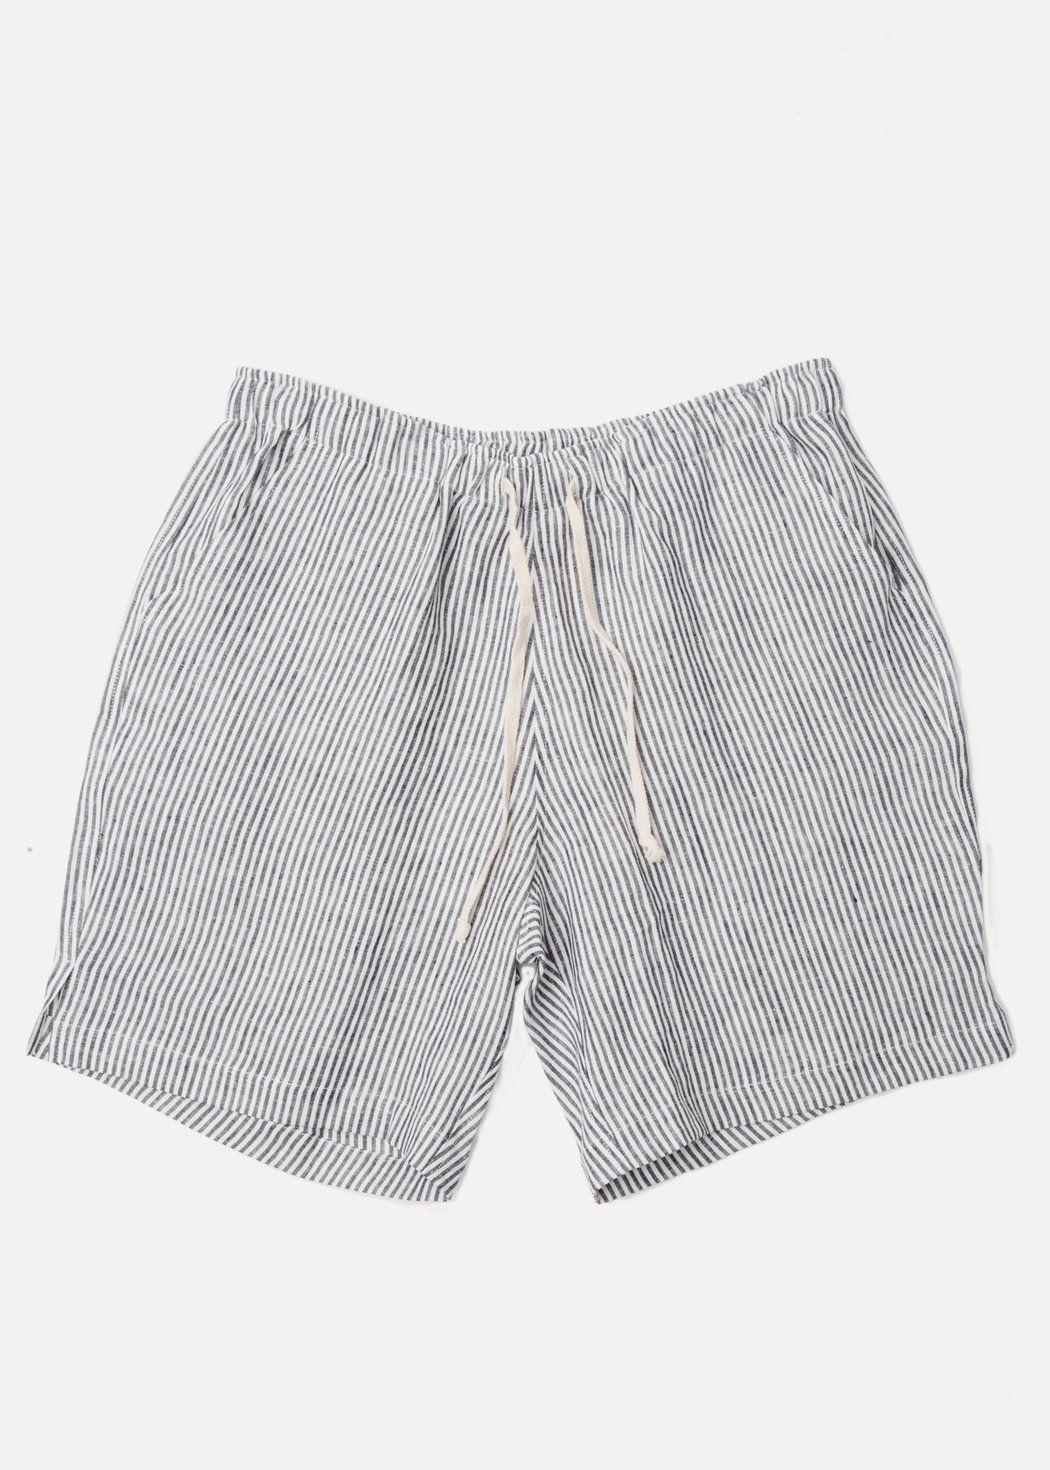 a3e0d7f110 100% Hemp Swimming Shorts Trunks by Rawganique.co Since 1997    Sweatshop-free   Chemical-Free